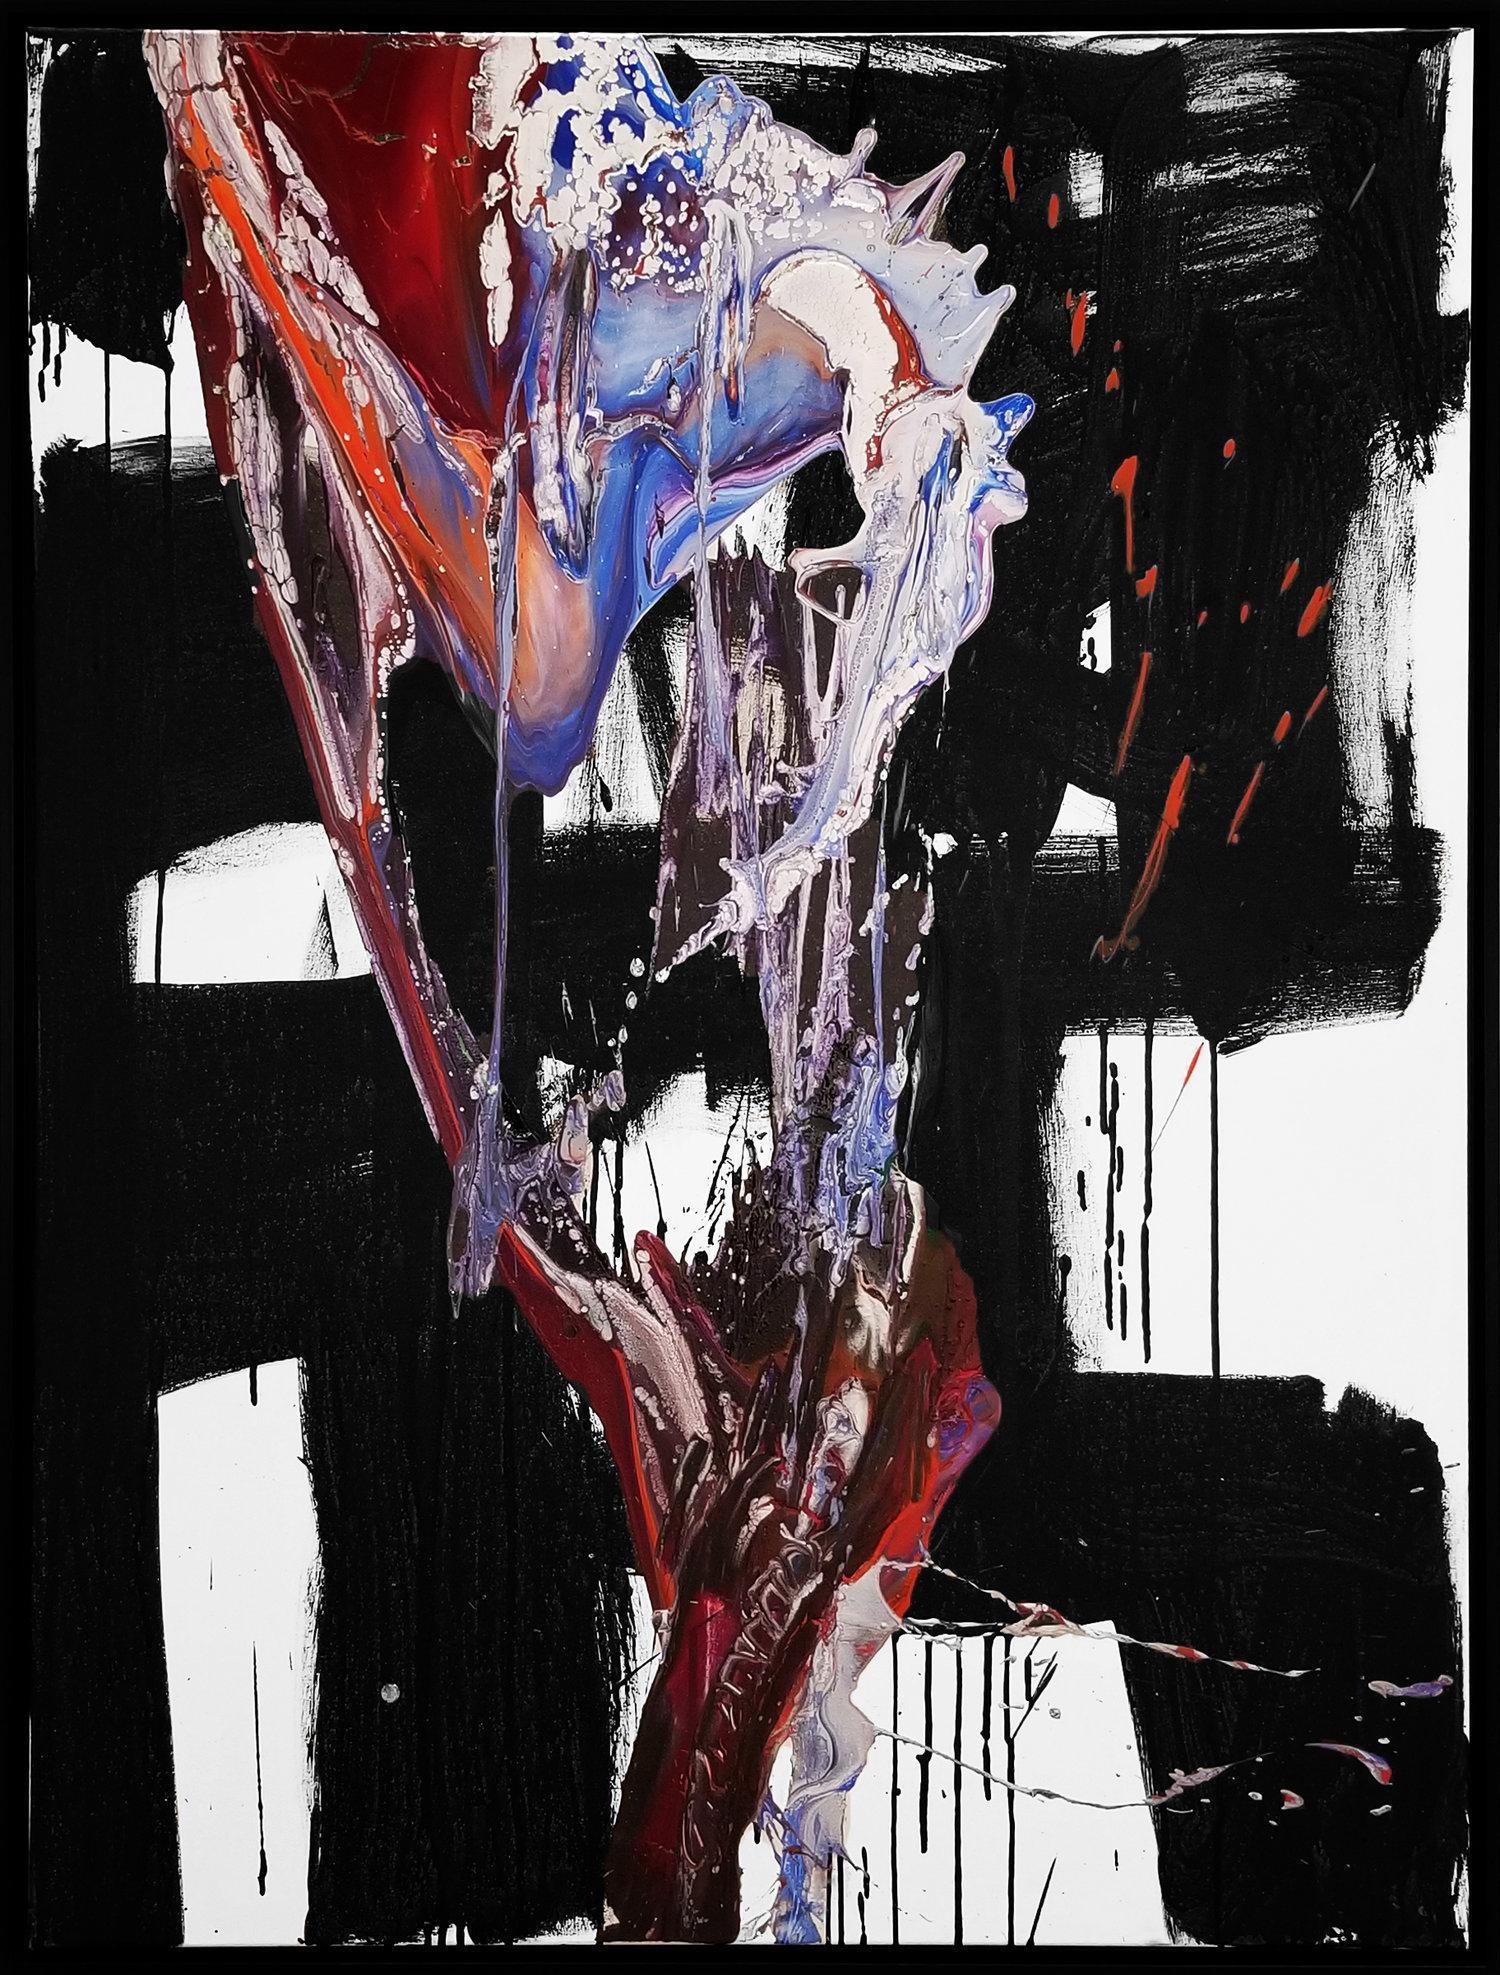 "Splash of Color 2 #130, 2018, acrylic on canvas, 48"" x 36"" (121 x 91.4 cm)"